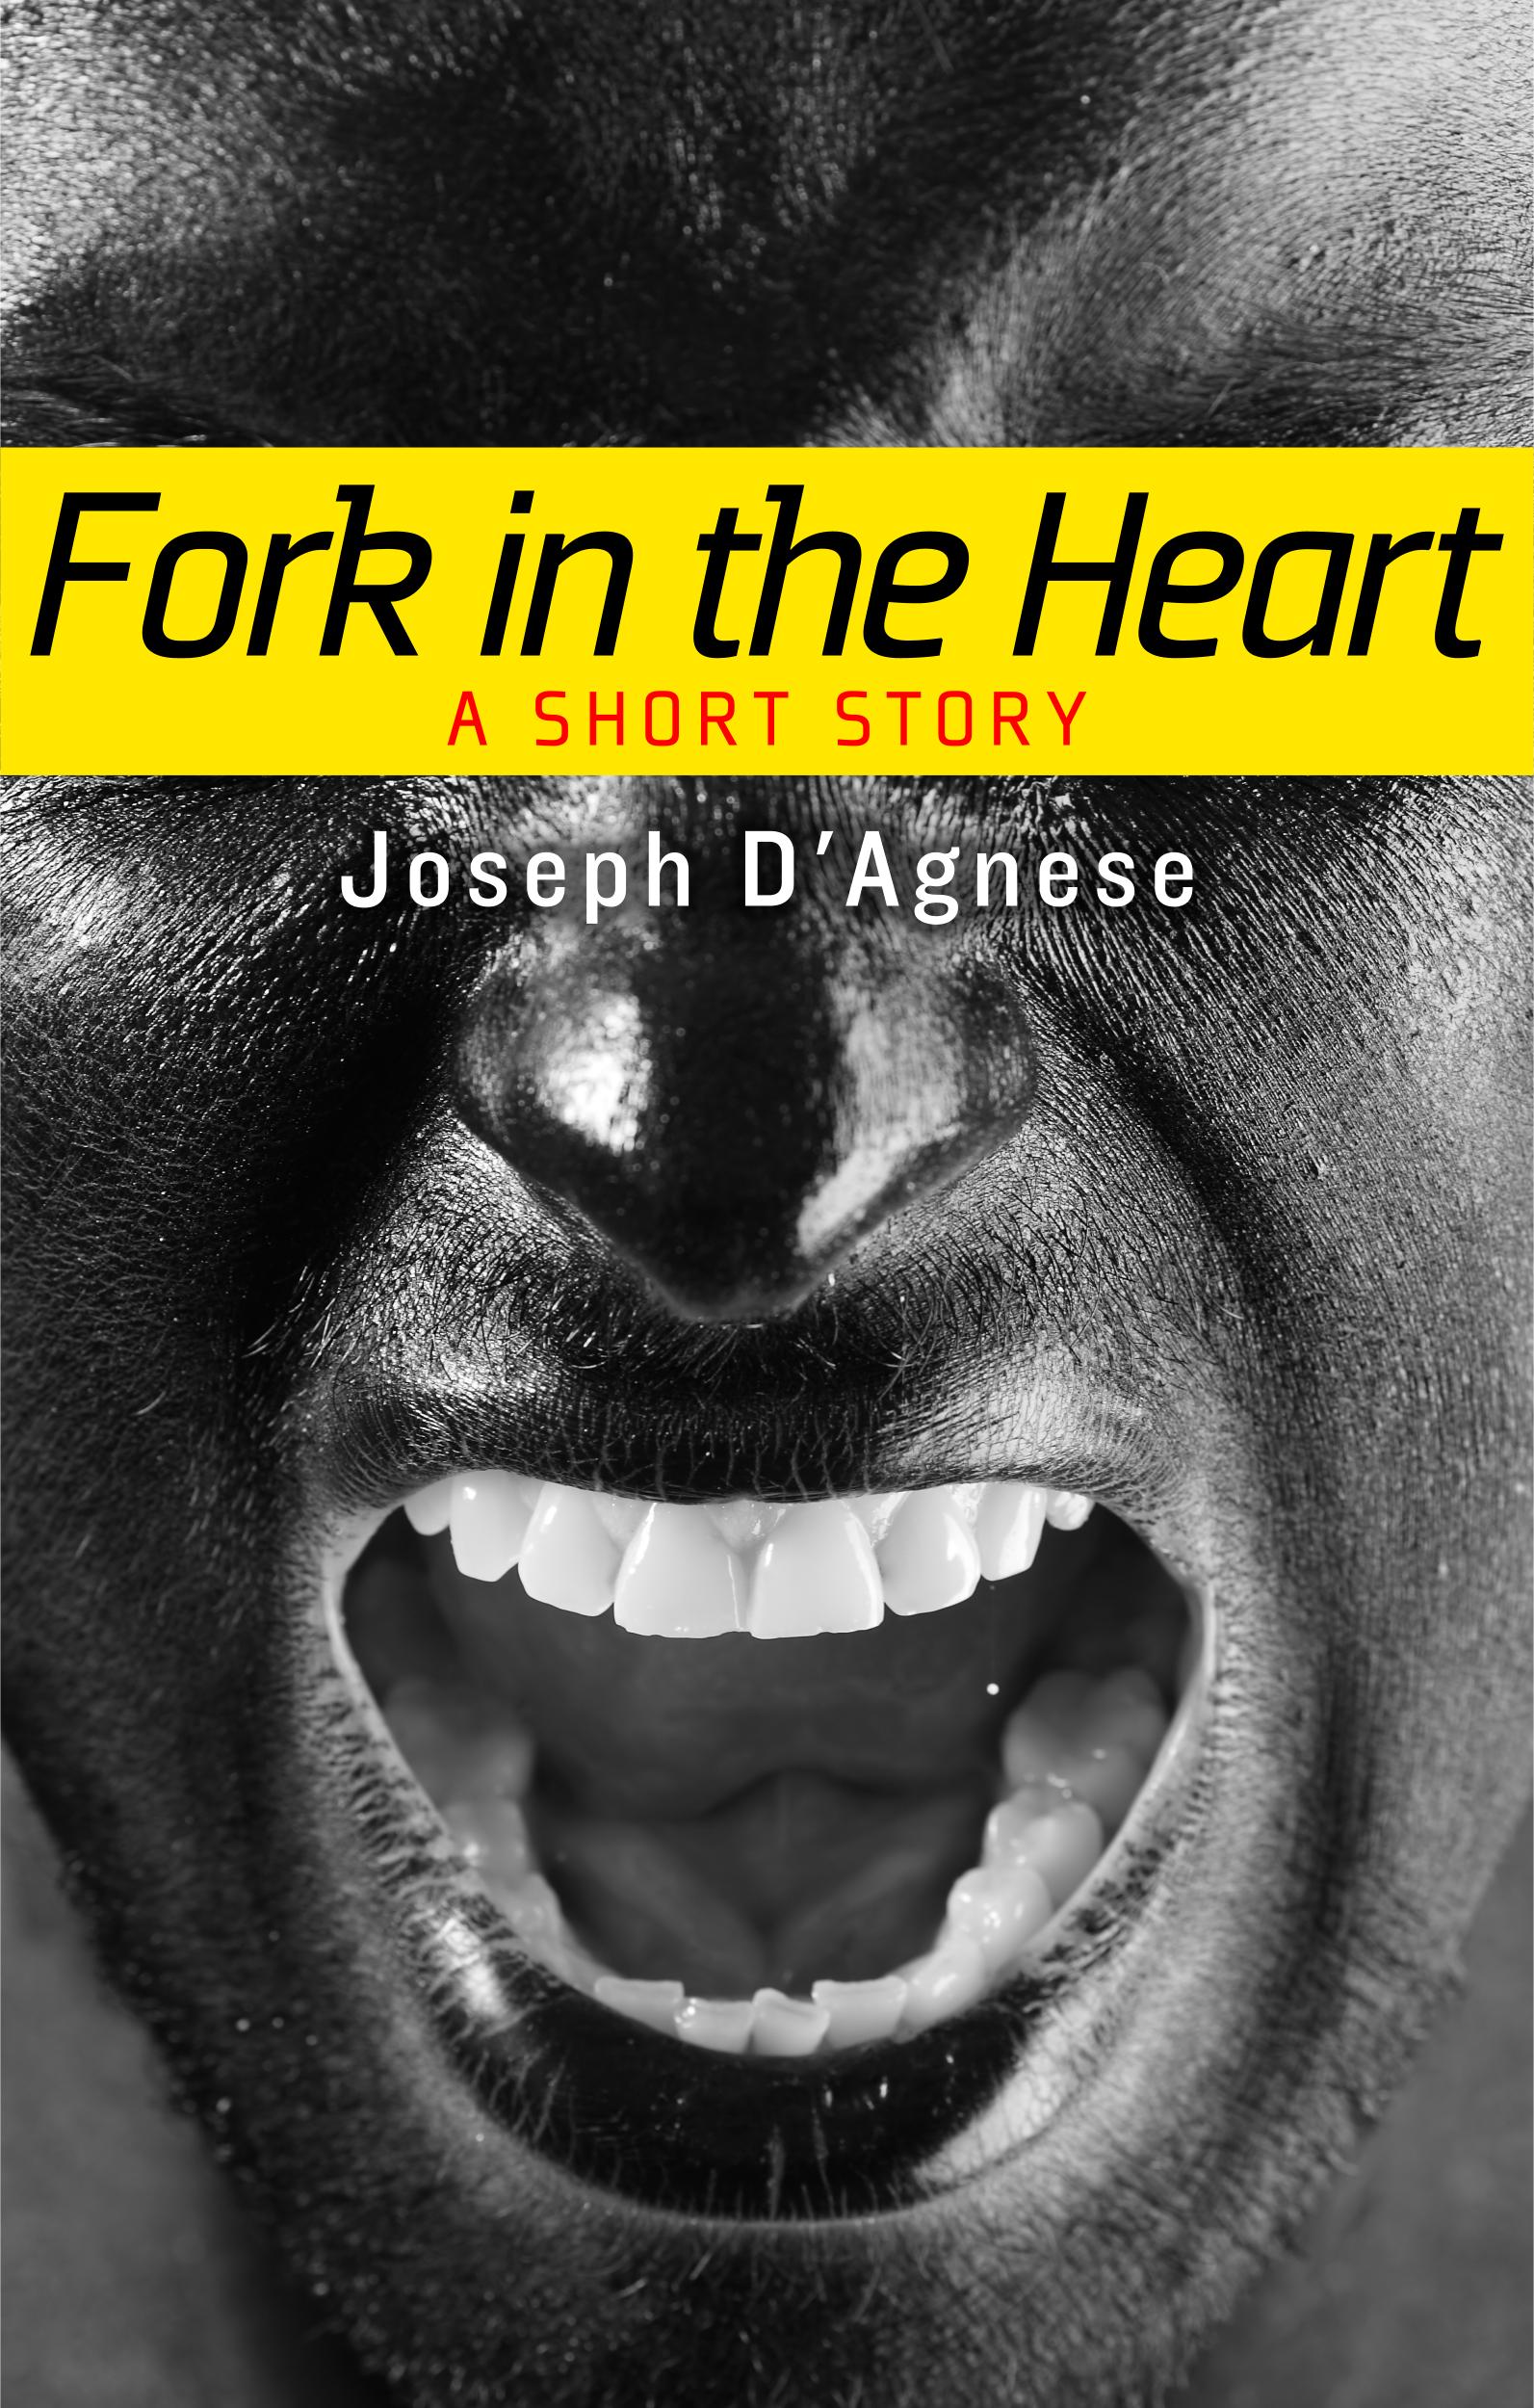 Fork in the Heart by Joseph D'Agnese